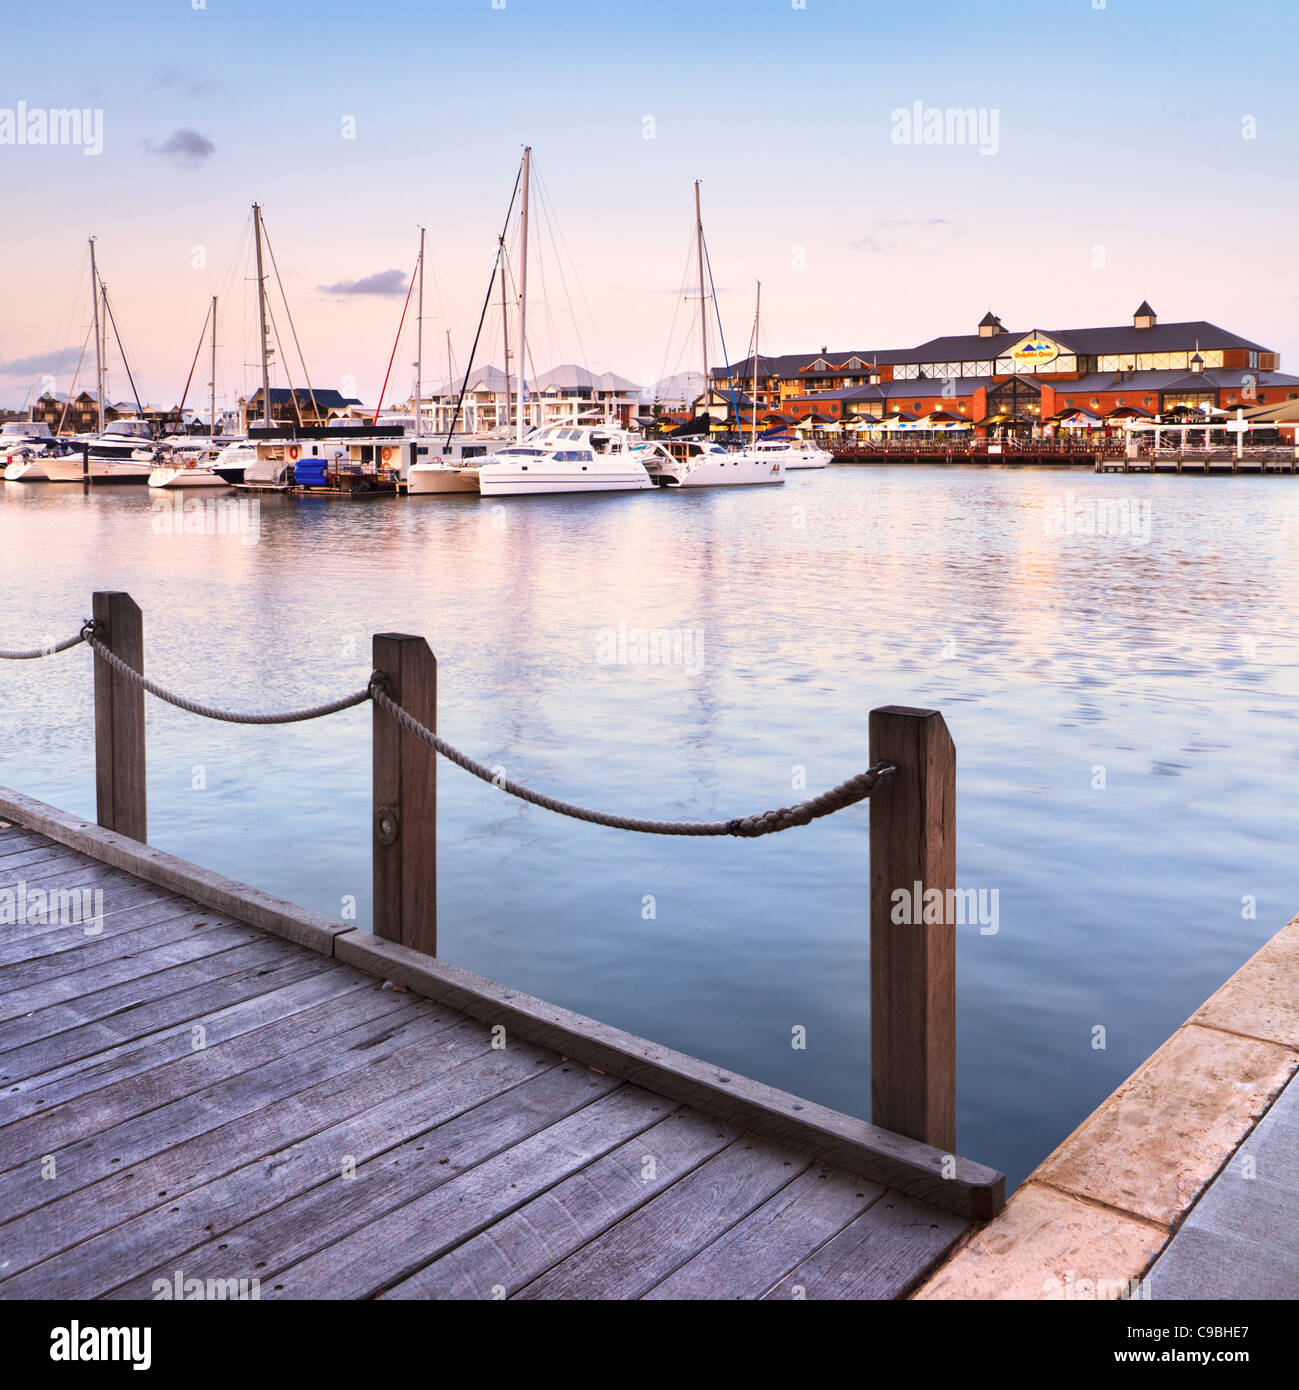 Dolhin Quay Ocean Marina in Mandurah, Western Australia - Stock Image